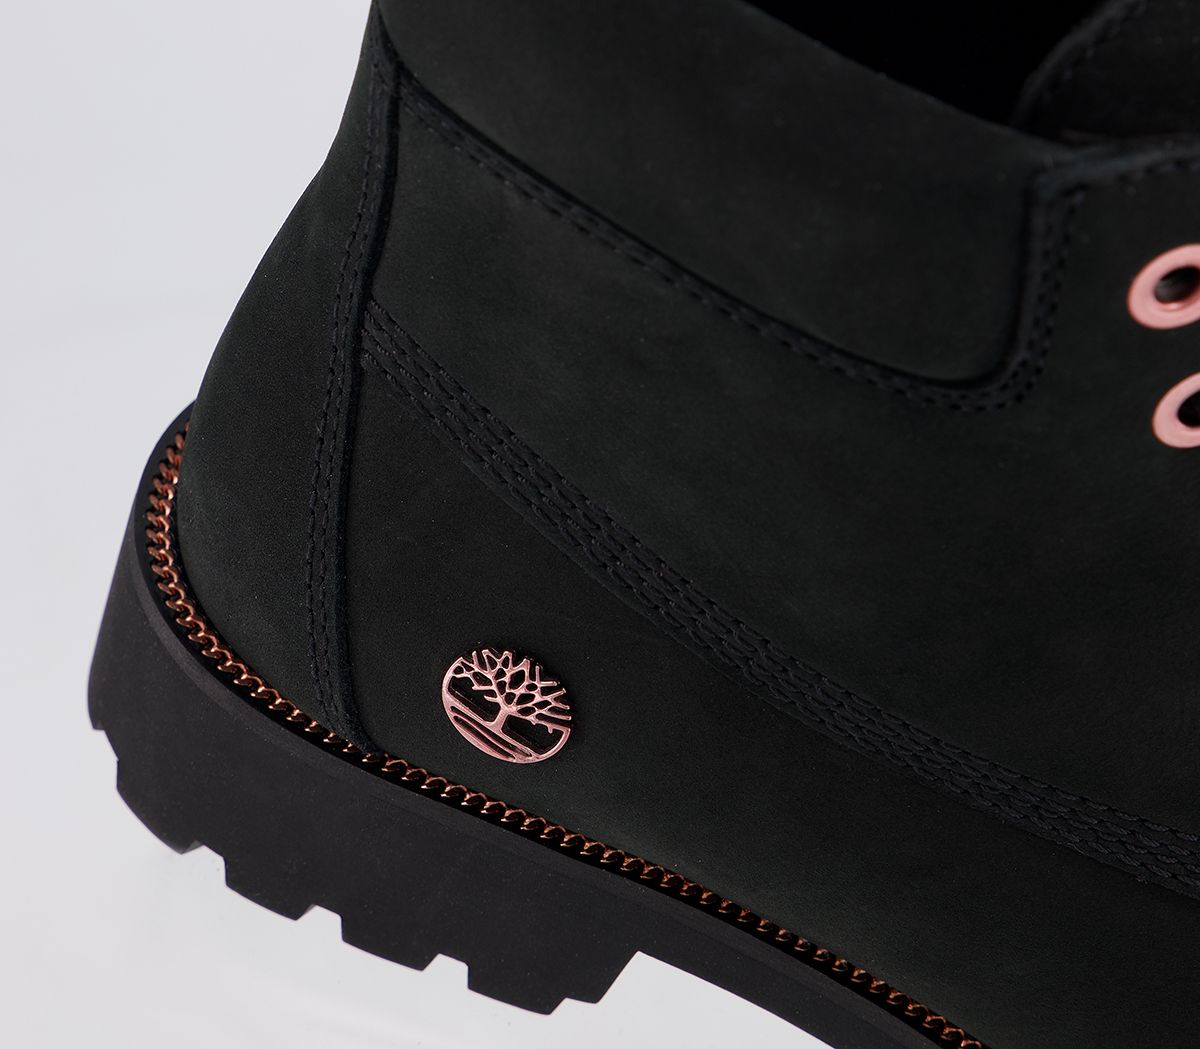 sobresalir Reparación posible Delgado  Womens Timberland Slim Premium 6 Inch Boots Black Rose Gold Chain Boots |  eBay